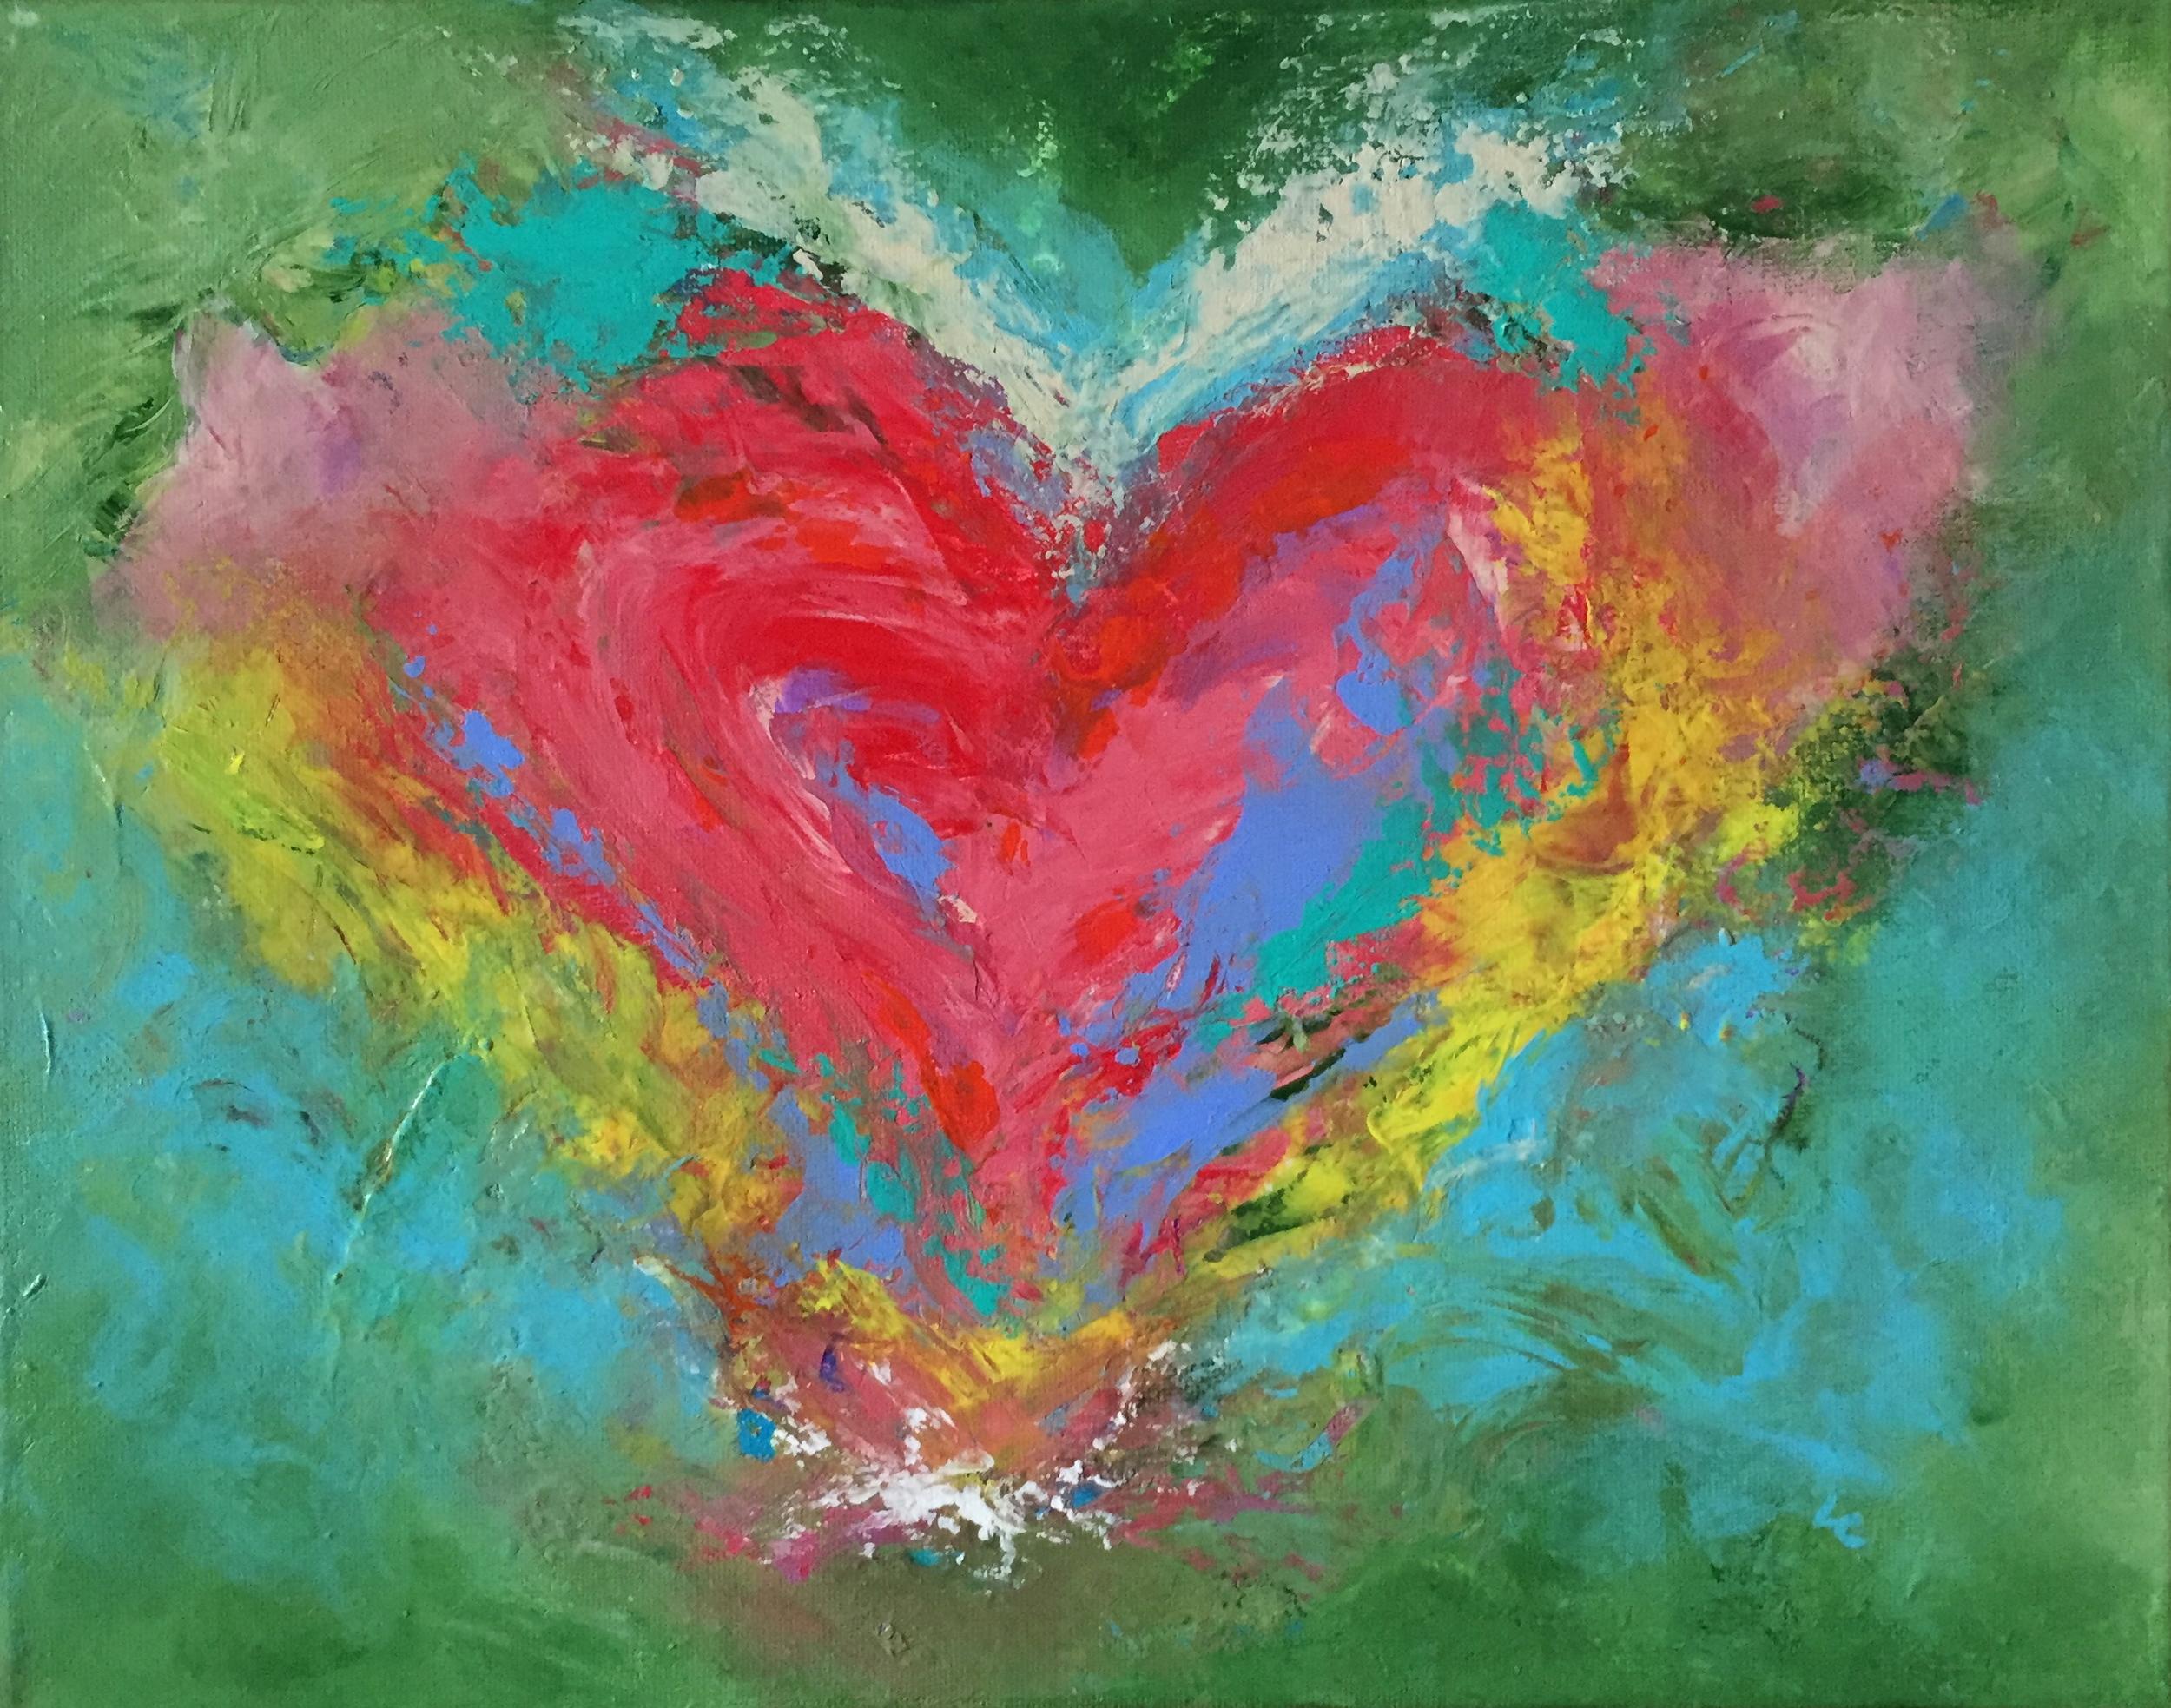 "Heart Shaped World 11"" x 14"" acrylic on canvas"